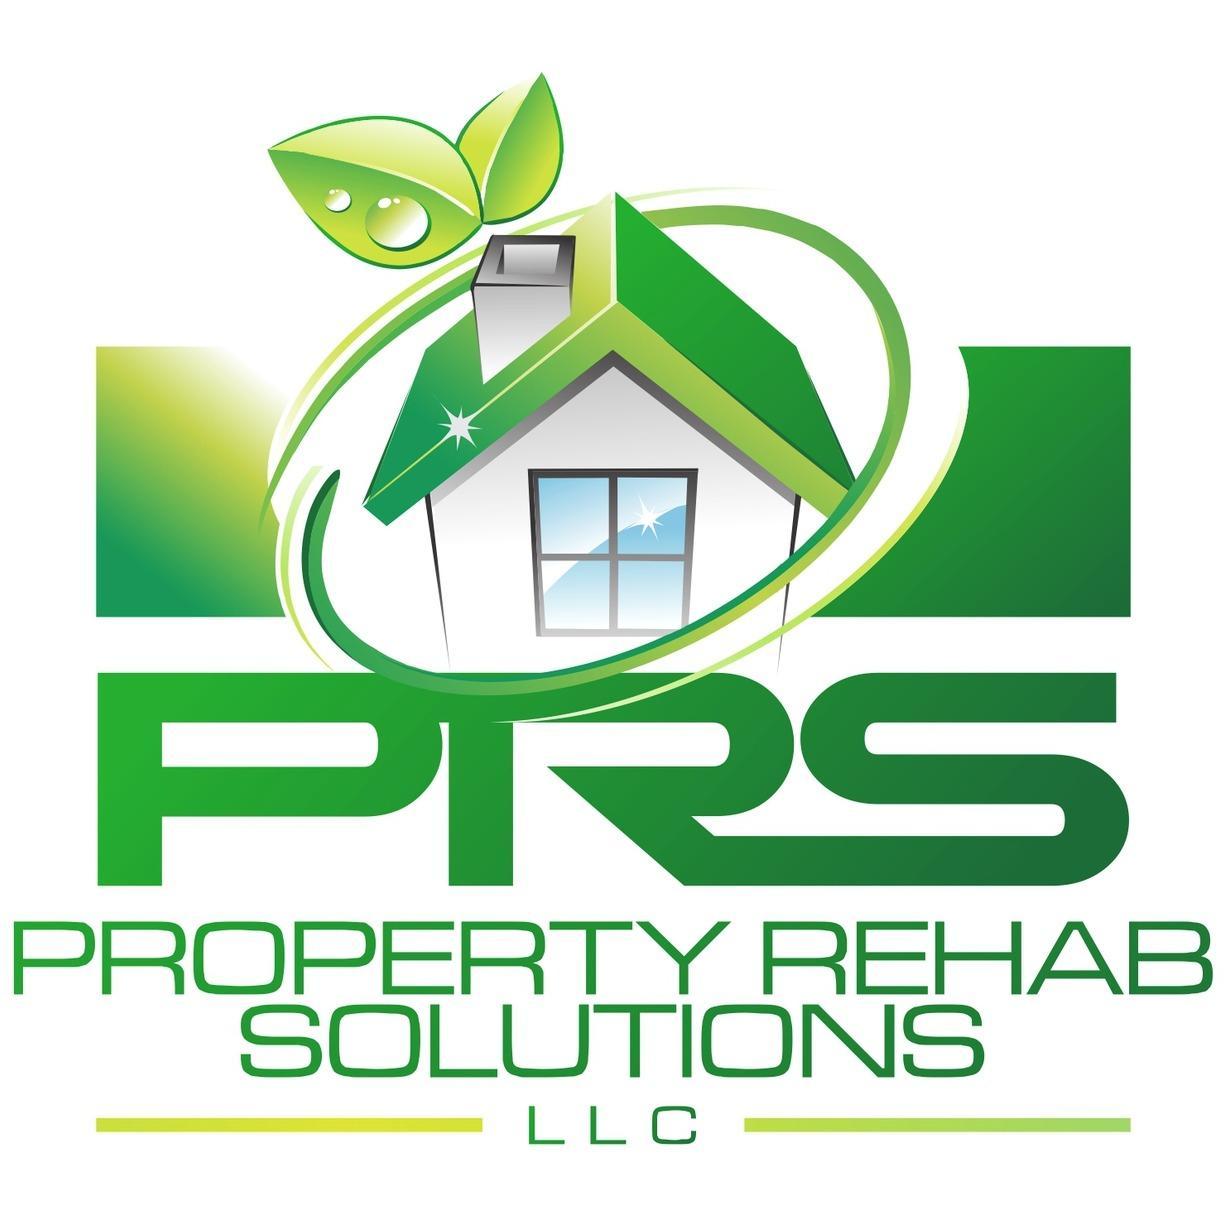 Property Rehab Solutions LLC